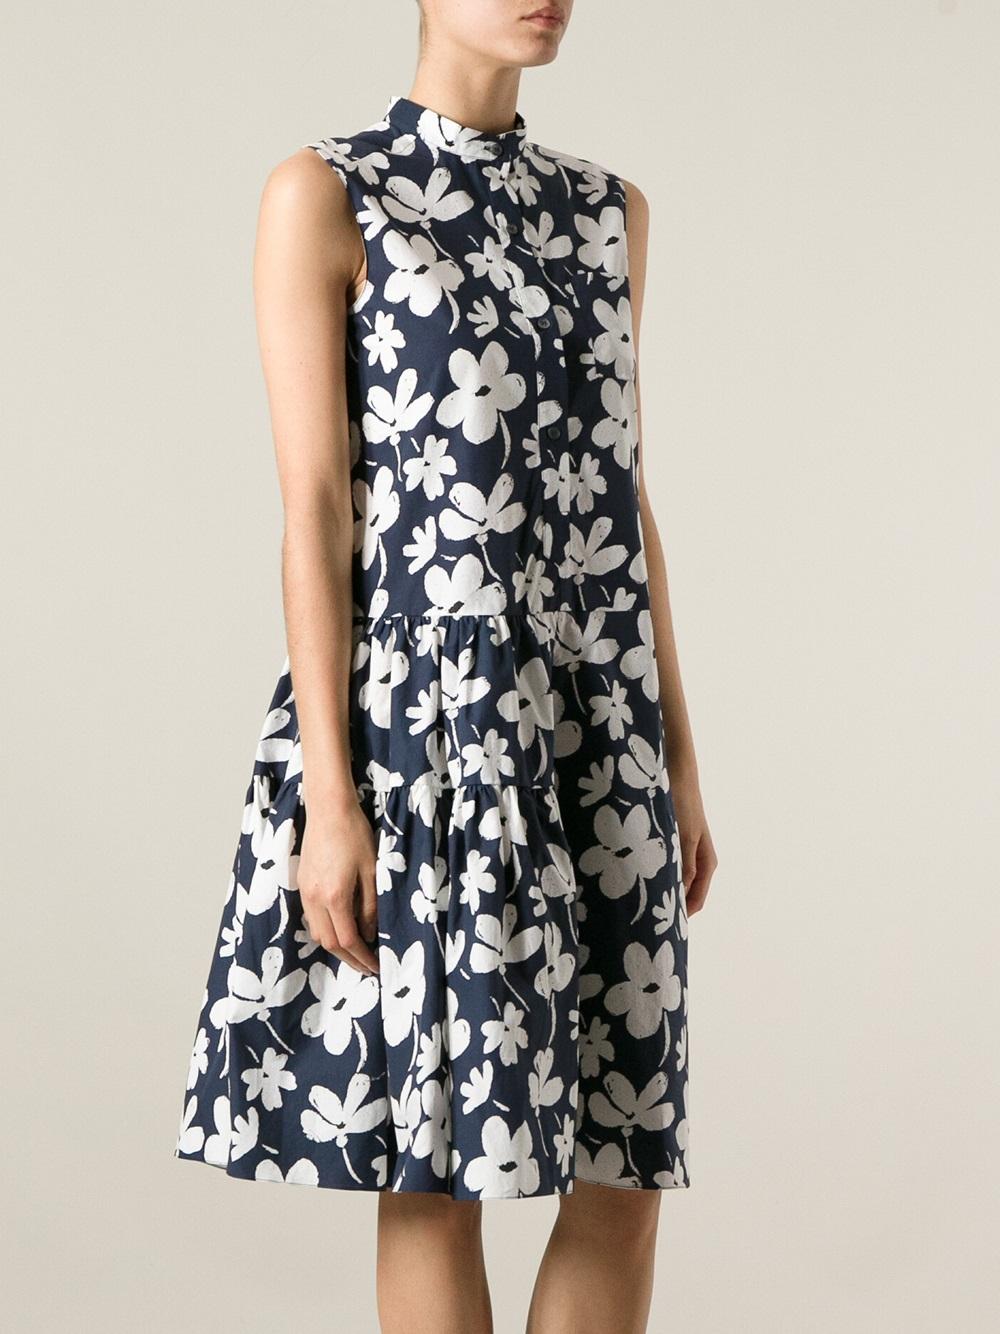 Lyst Marni Floral Print Dress In Blue